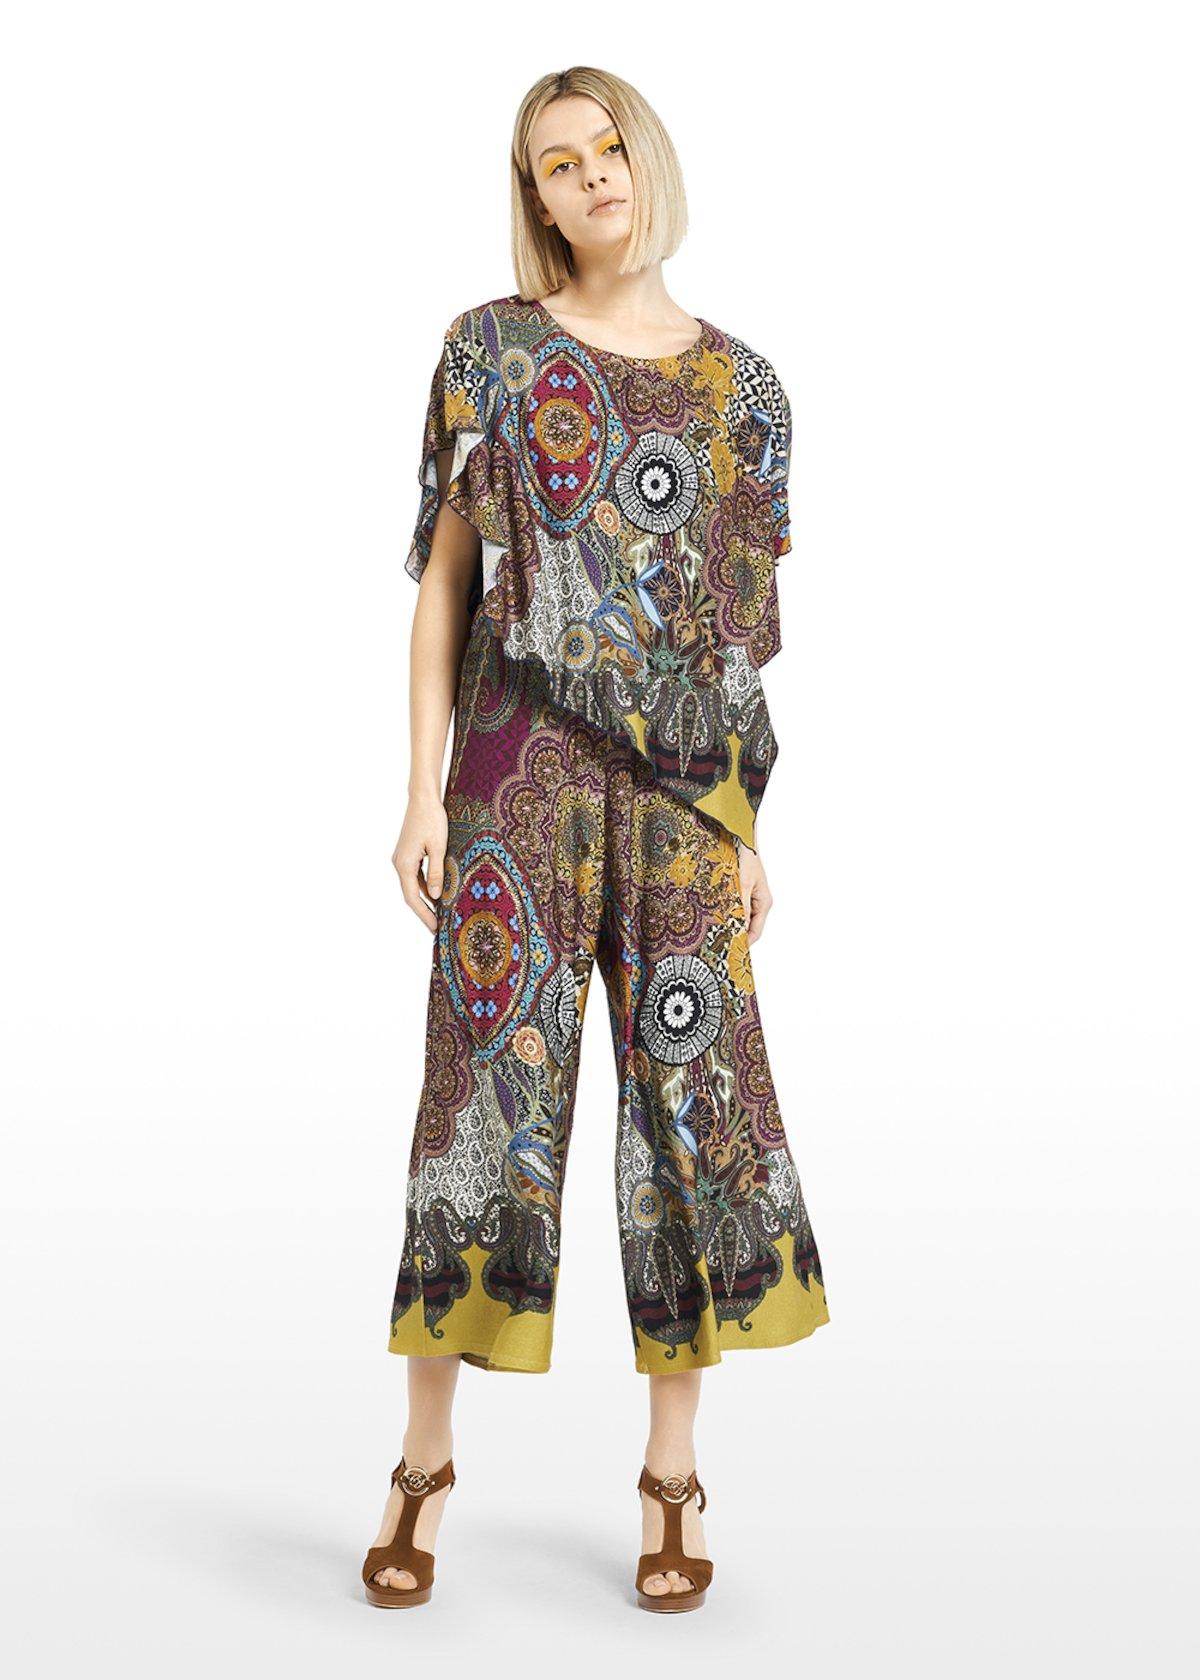 Sveva bimaterial T-shirt with ruffle sleeves - Miele / Black Fantasia - Woman - Category image